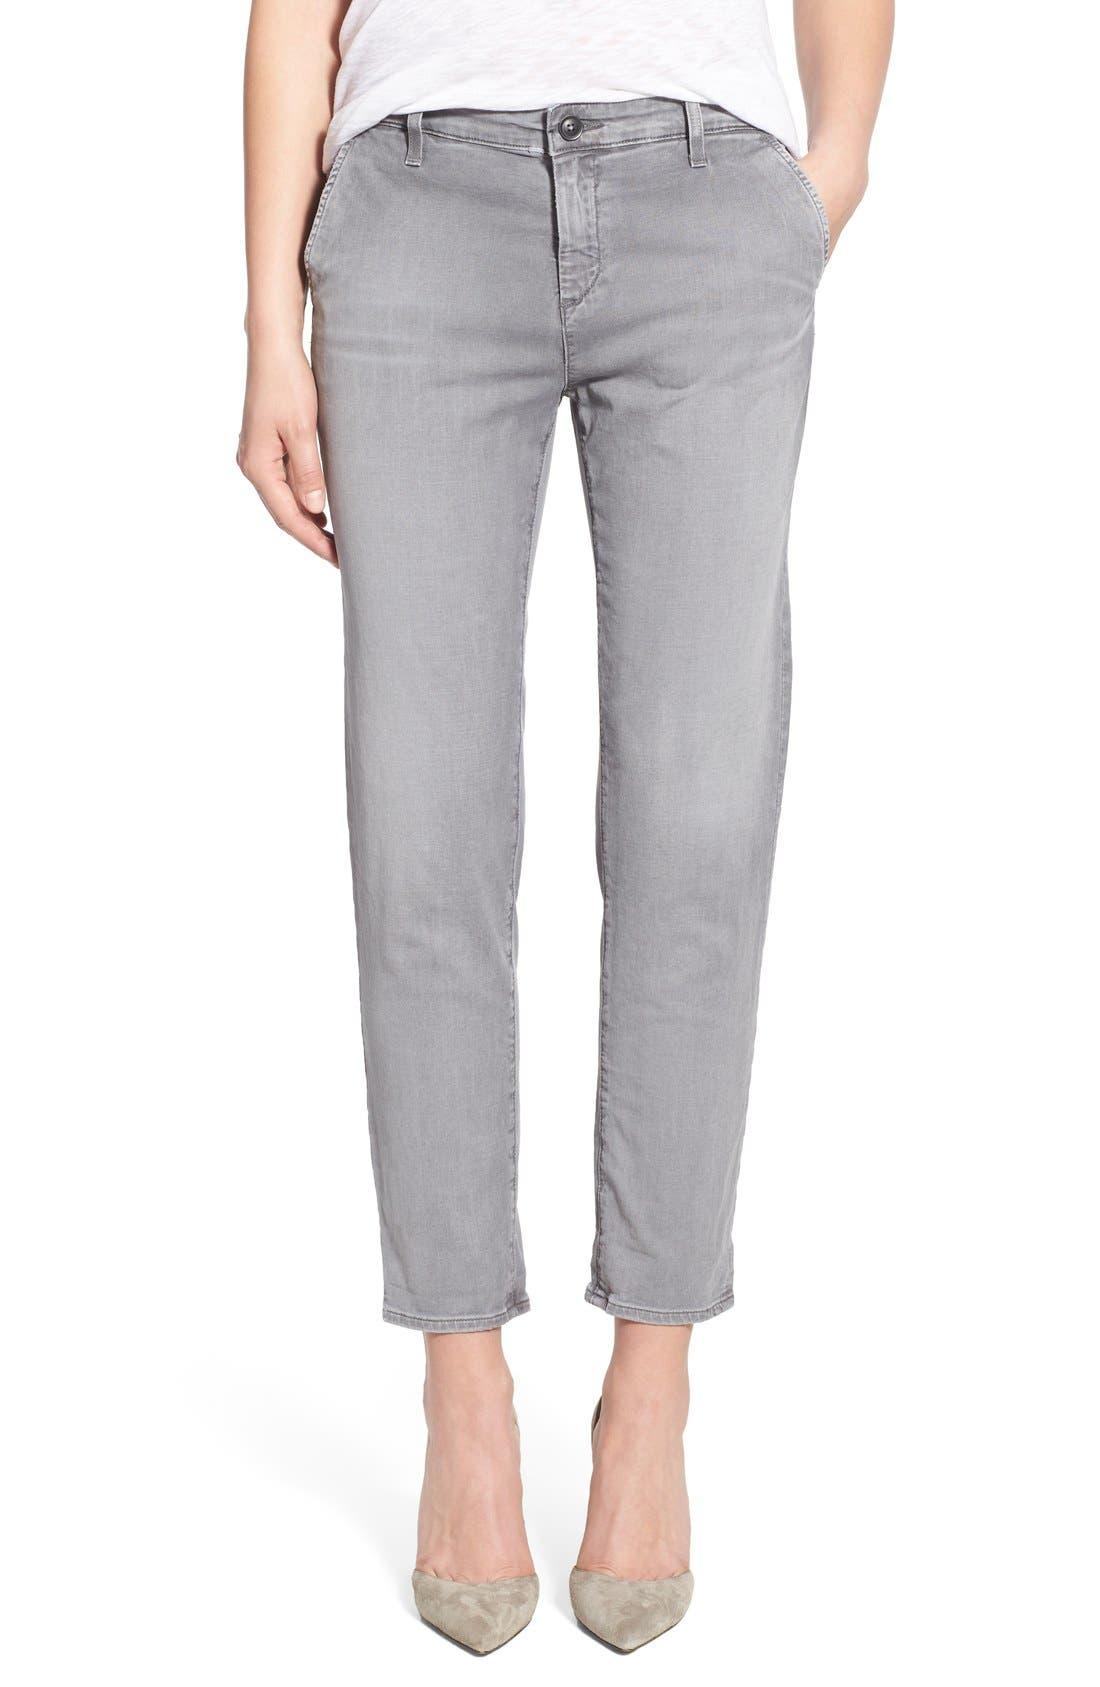 AG 'Caden' Crop Slim Jeans, Main, color, 020